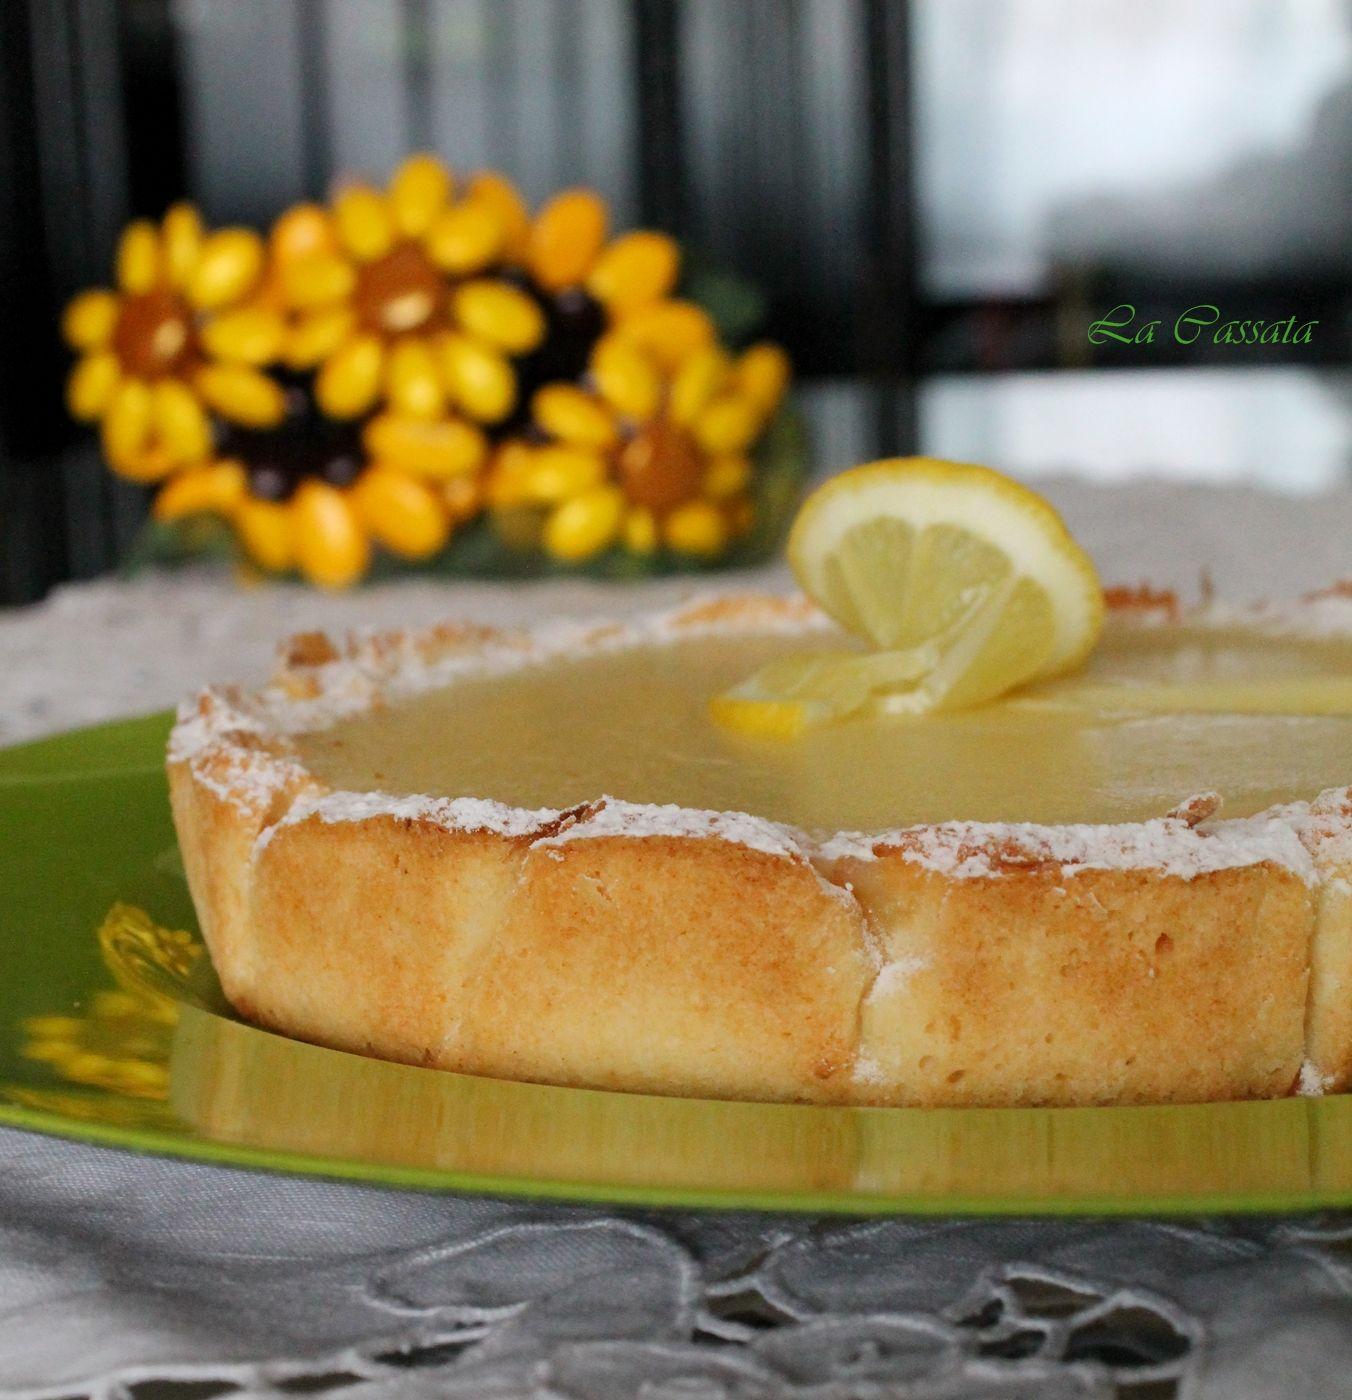 Photos And Recipes Of Lemon Sponge Cakes Of Sorrento